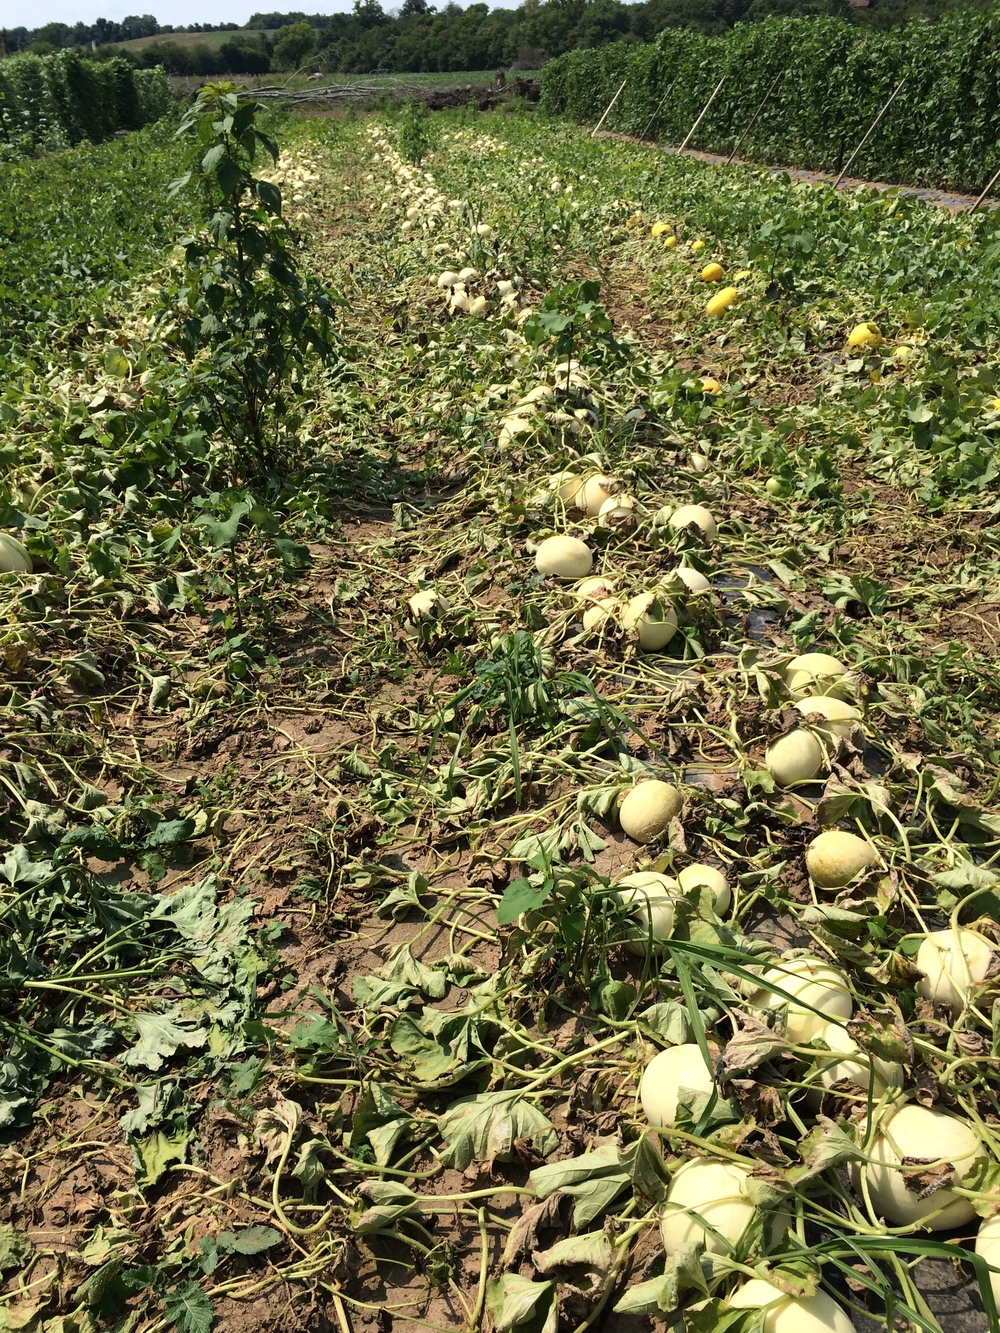 It's like a melon graveyard… so depressing